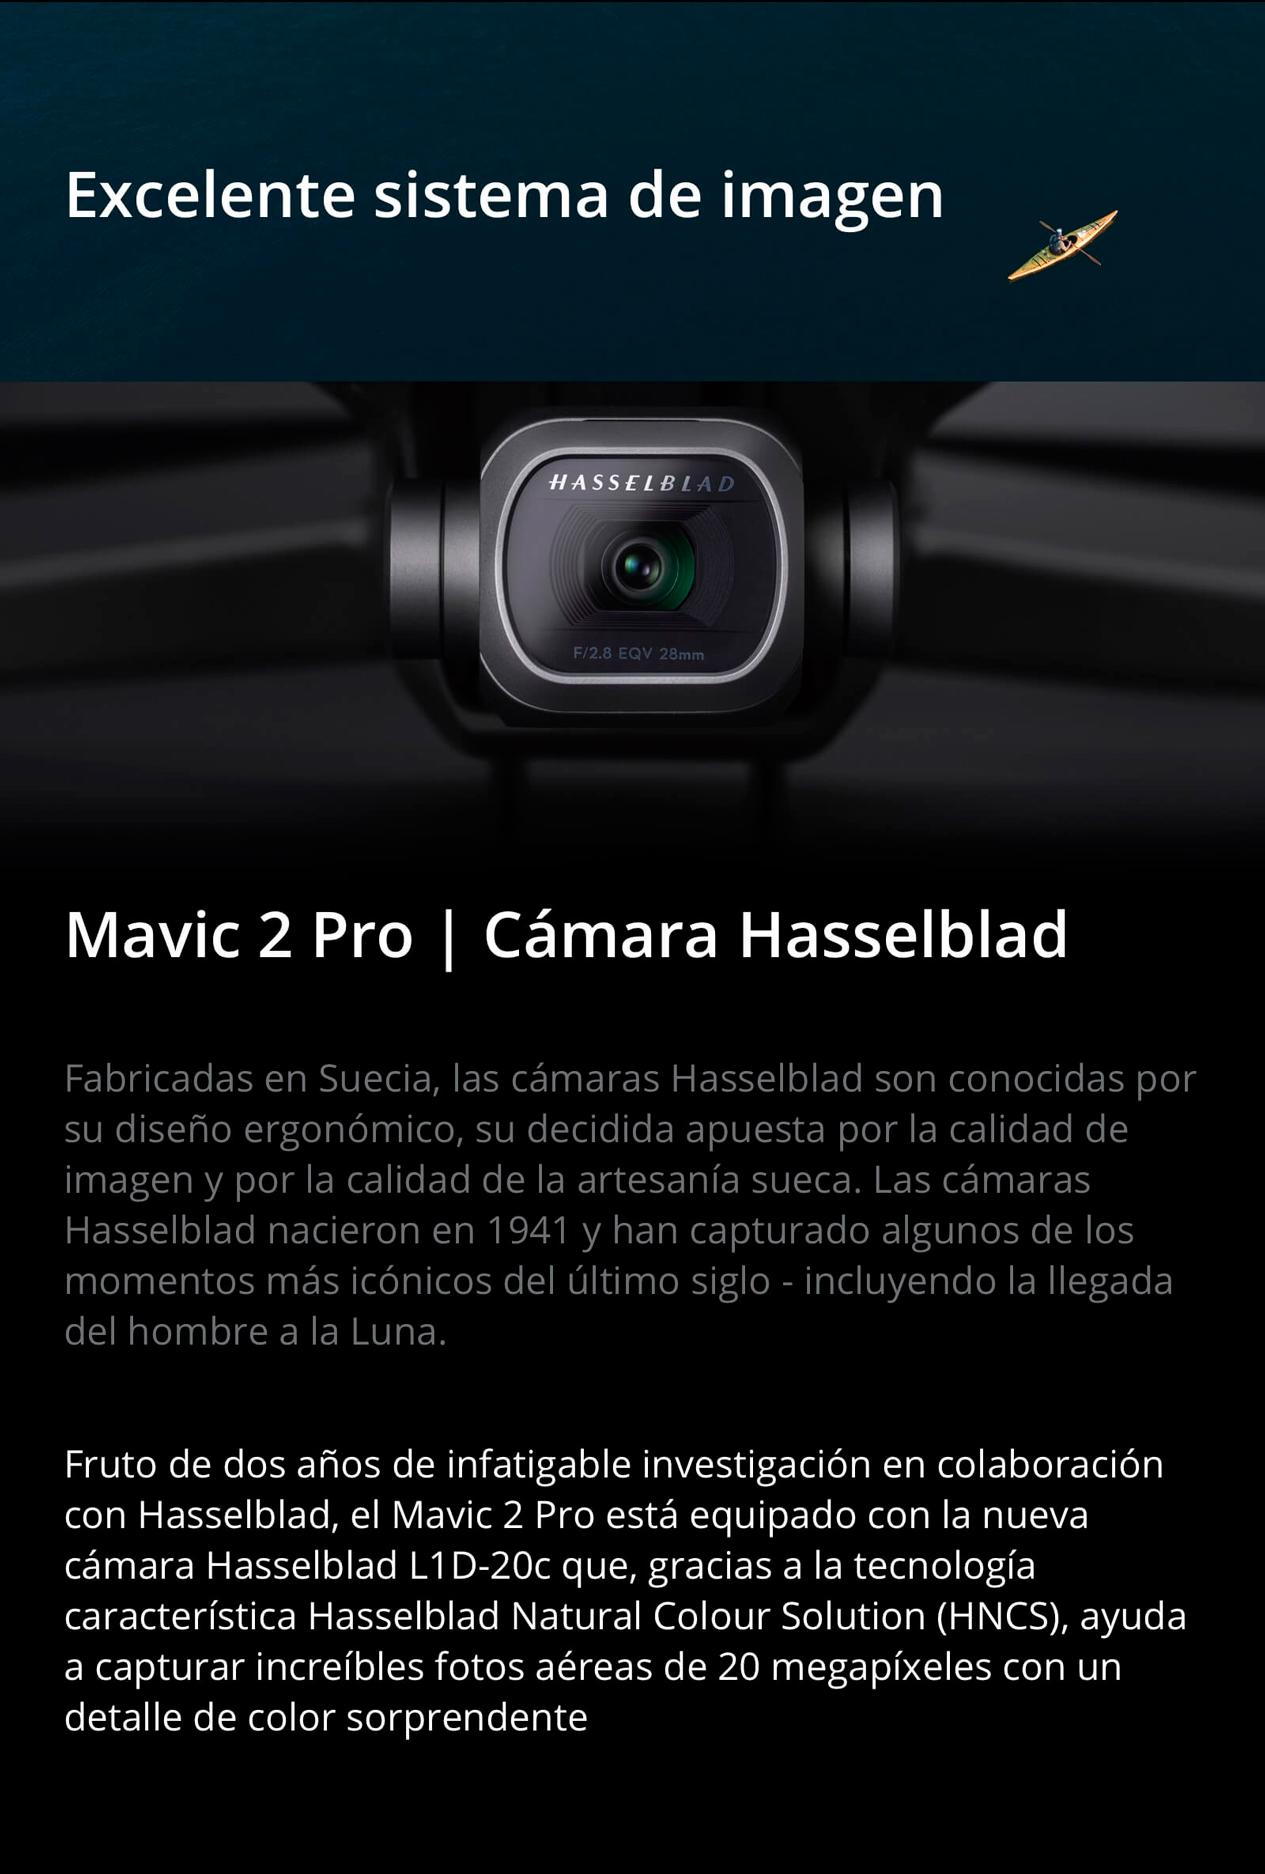 DJI MAVIC 2 PRO - Excelente sistema de imágen